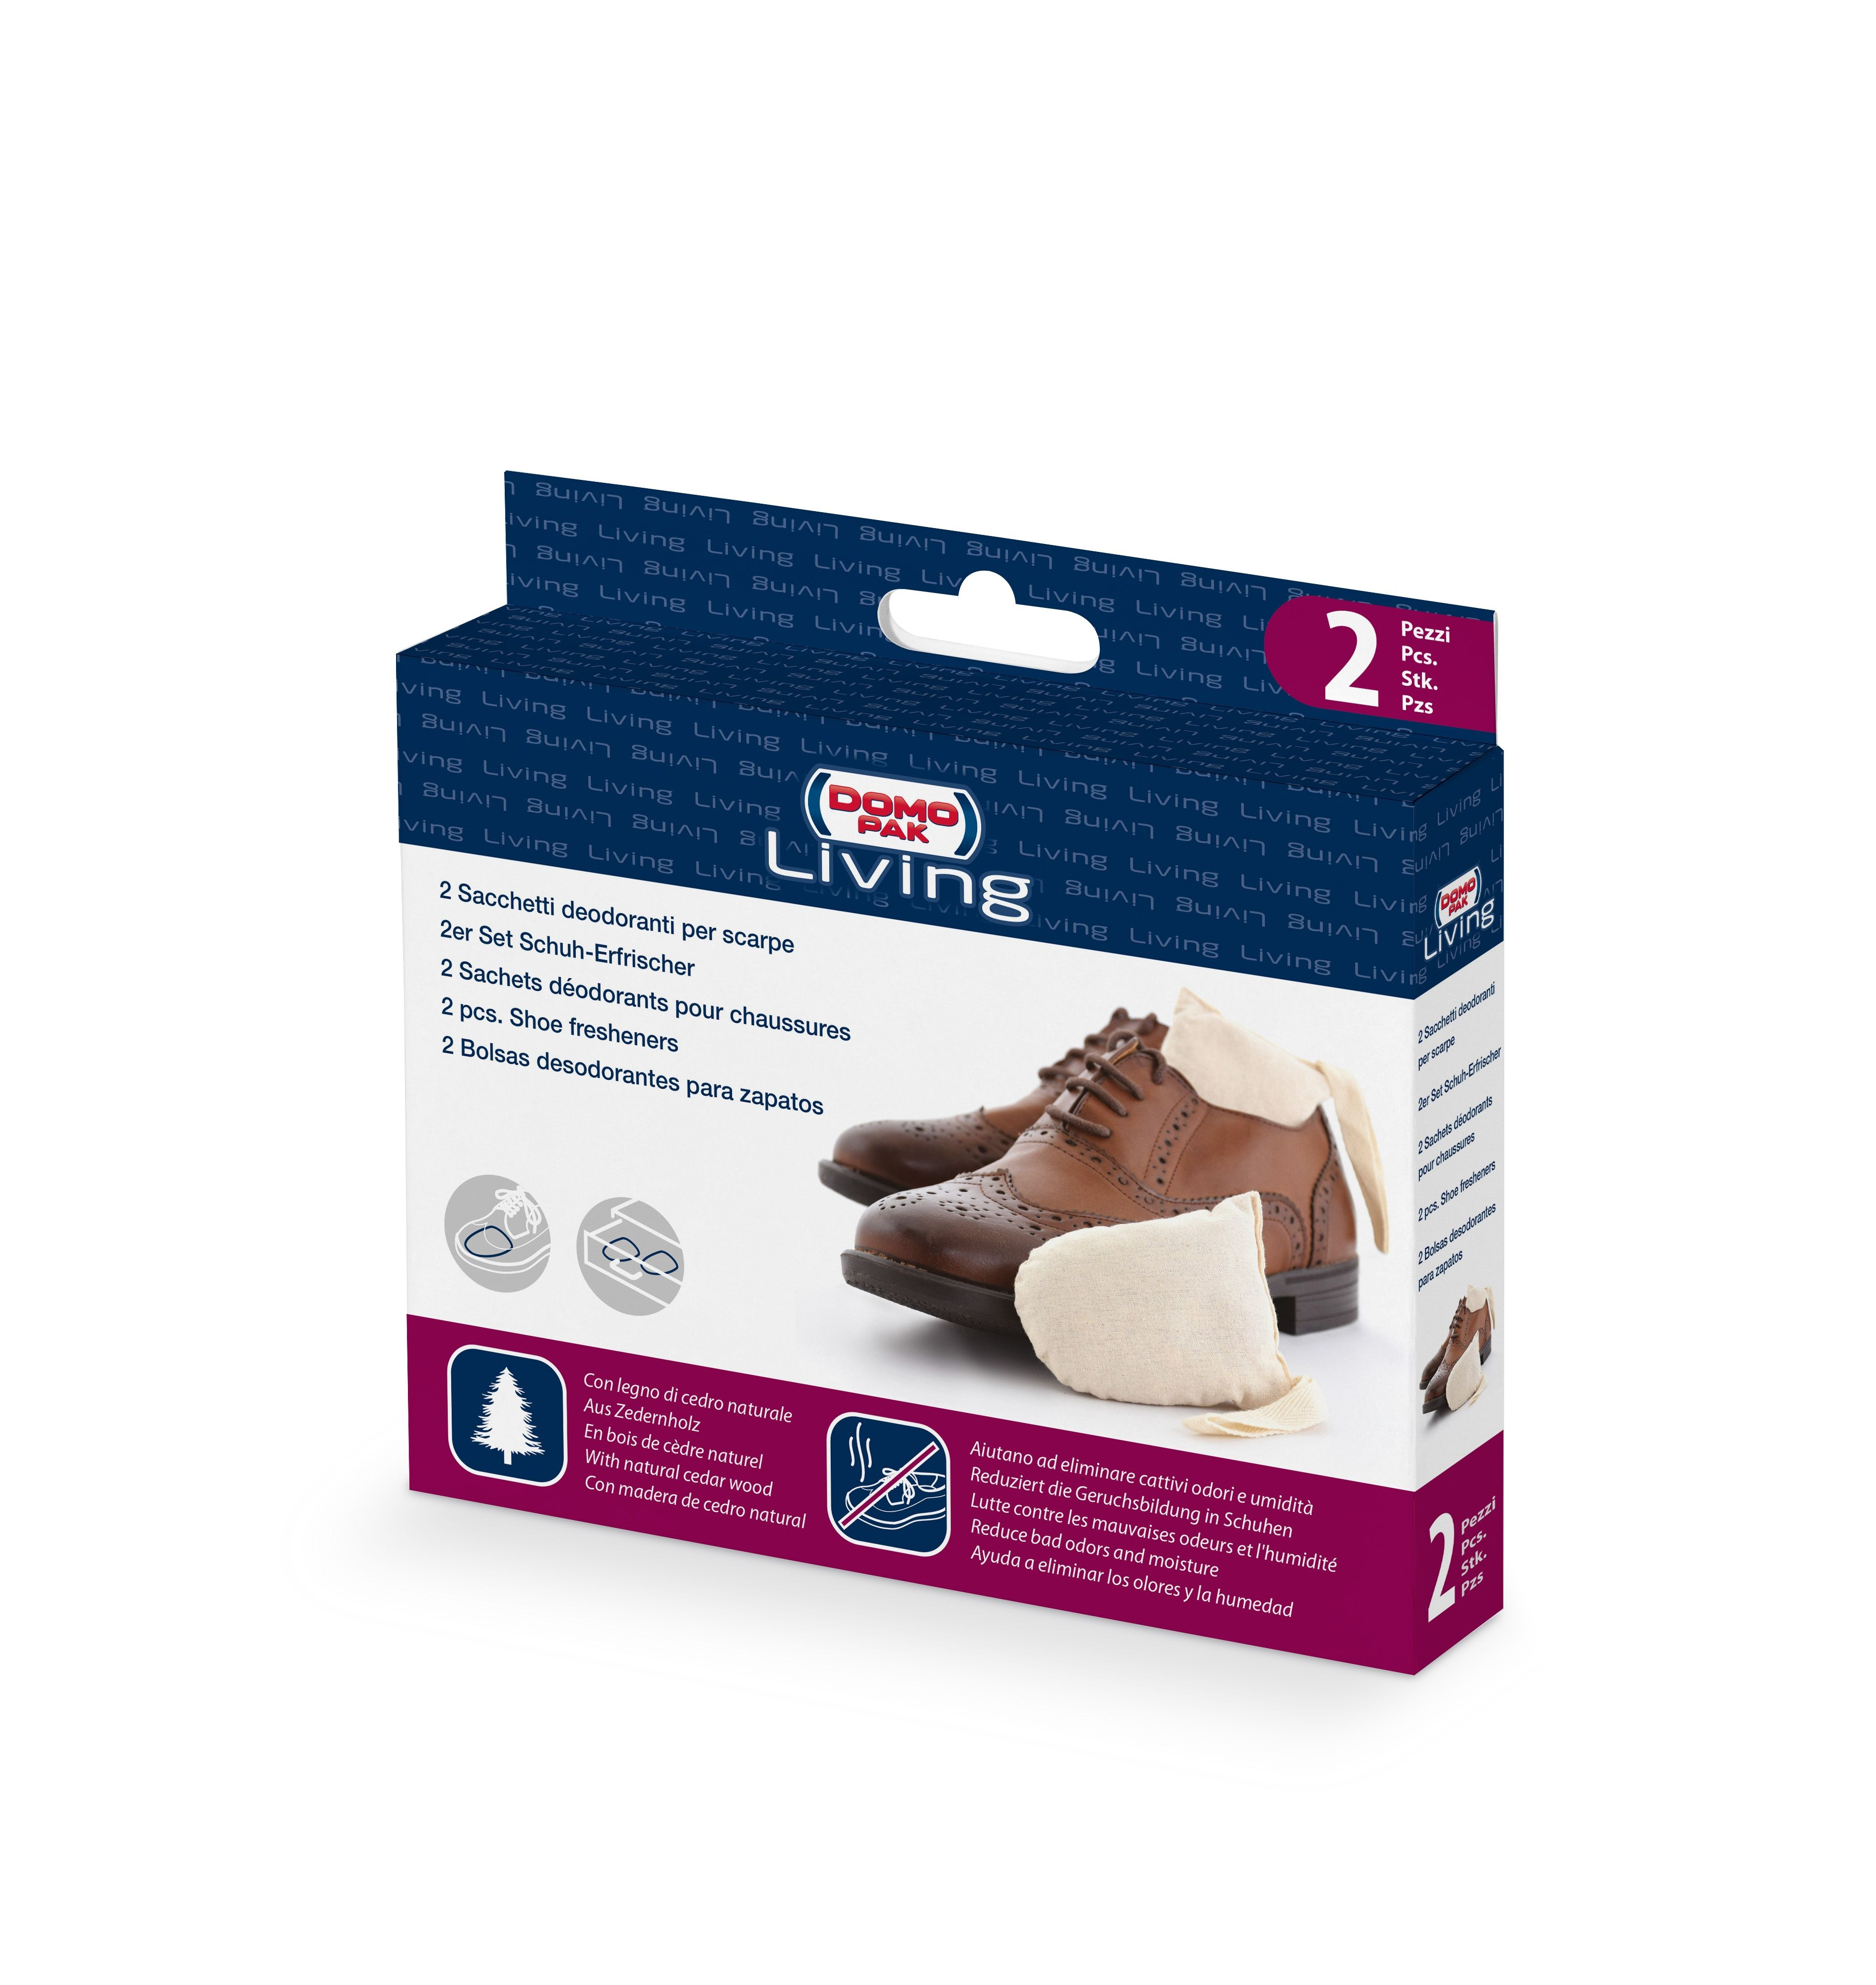 Set odorizant incaltaminte din lemn de cedru, 2 bucati, Shoes Crem, L11xl8xH2,5 cm imagine